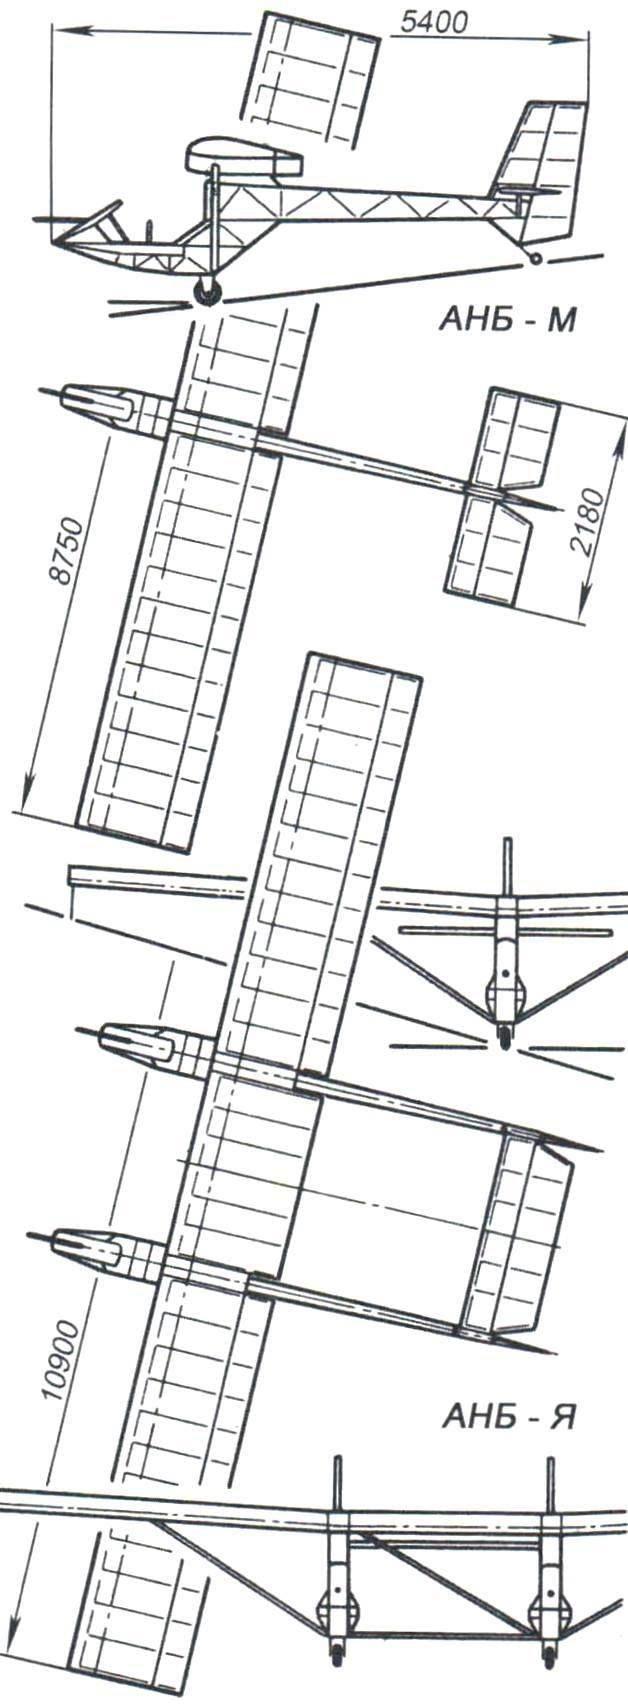 Training gliders design P. Alimarina